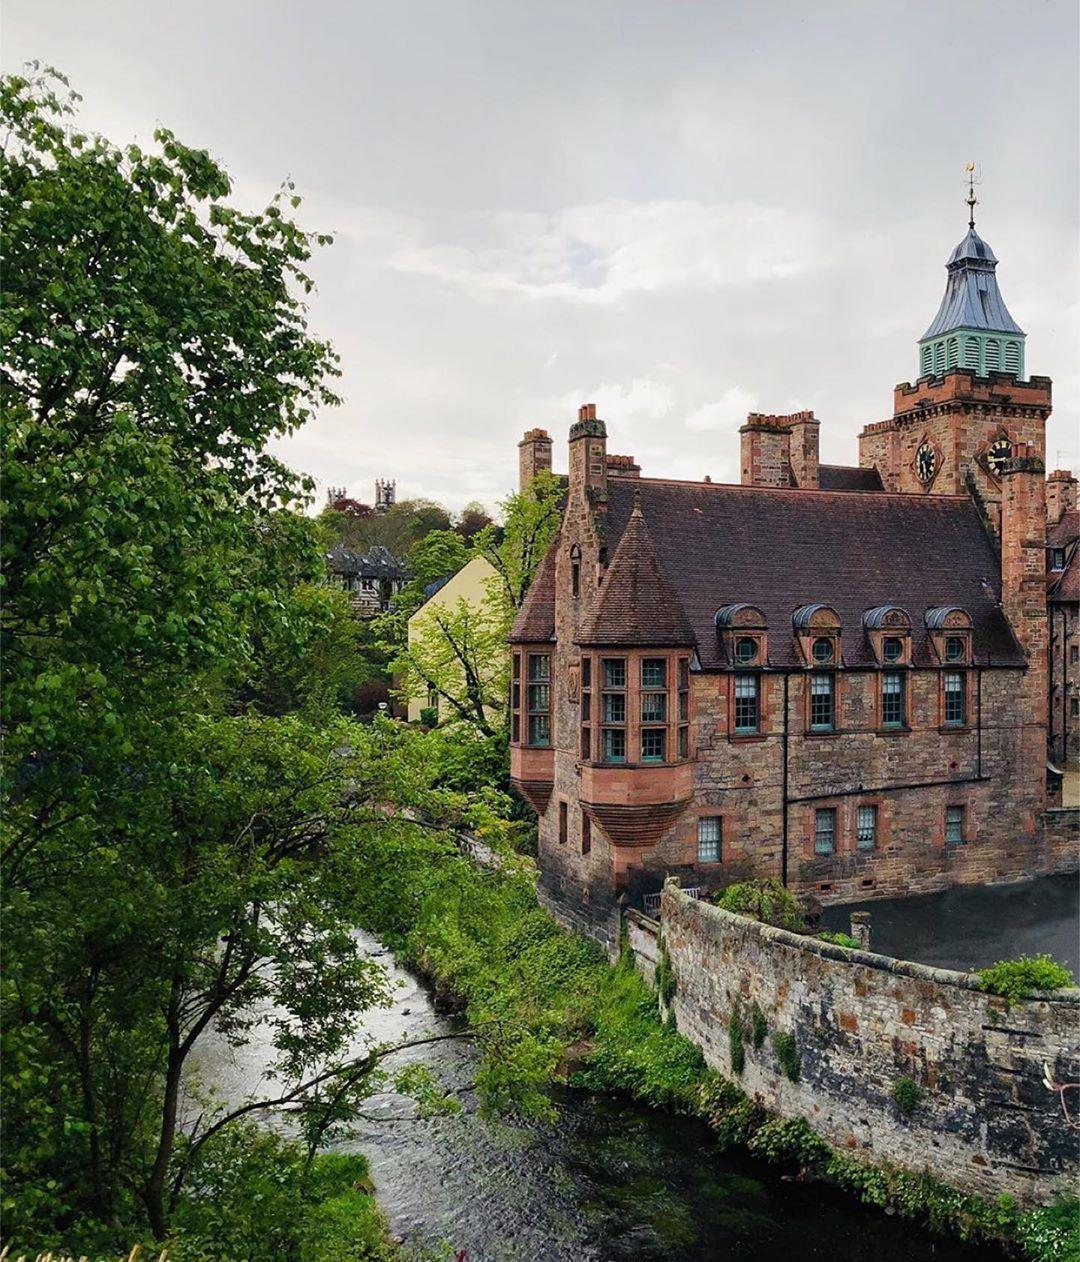 Credit to @edinburghclicks : EdinburghClick by 📸 @wignerpix 🥇 Selected by @pandeyrr  🥇🏆CONGRATULATIONS 🏆🥇 💐❤️ BEAUTIFUL SHOT ❤️💐  #edinburgh #edinburghcastle #edinburghlife #edinburghbloggers #edinburghcity #edinburghscotland #scotland #travel #Travelgram #traveling #Travelphotography #travelling #travelblogger #traveler #traveller #travelingram #traveltheworld #travelblog #travels #traveladdict #travellife #travelpics #traveldiaries #TravelAwesome #trave